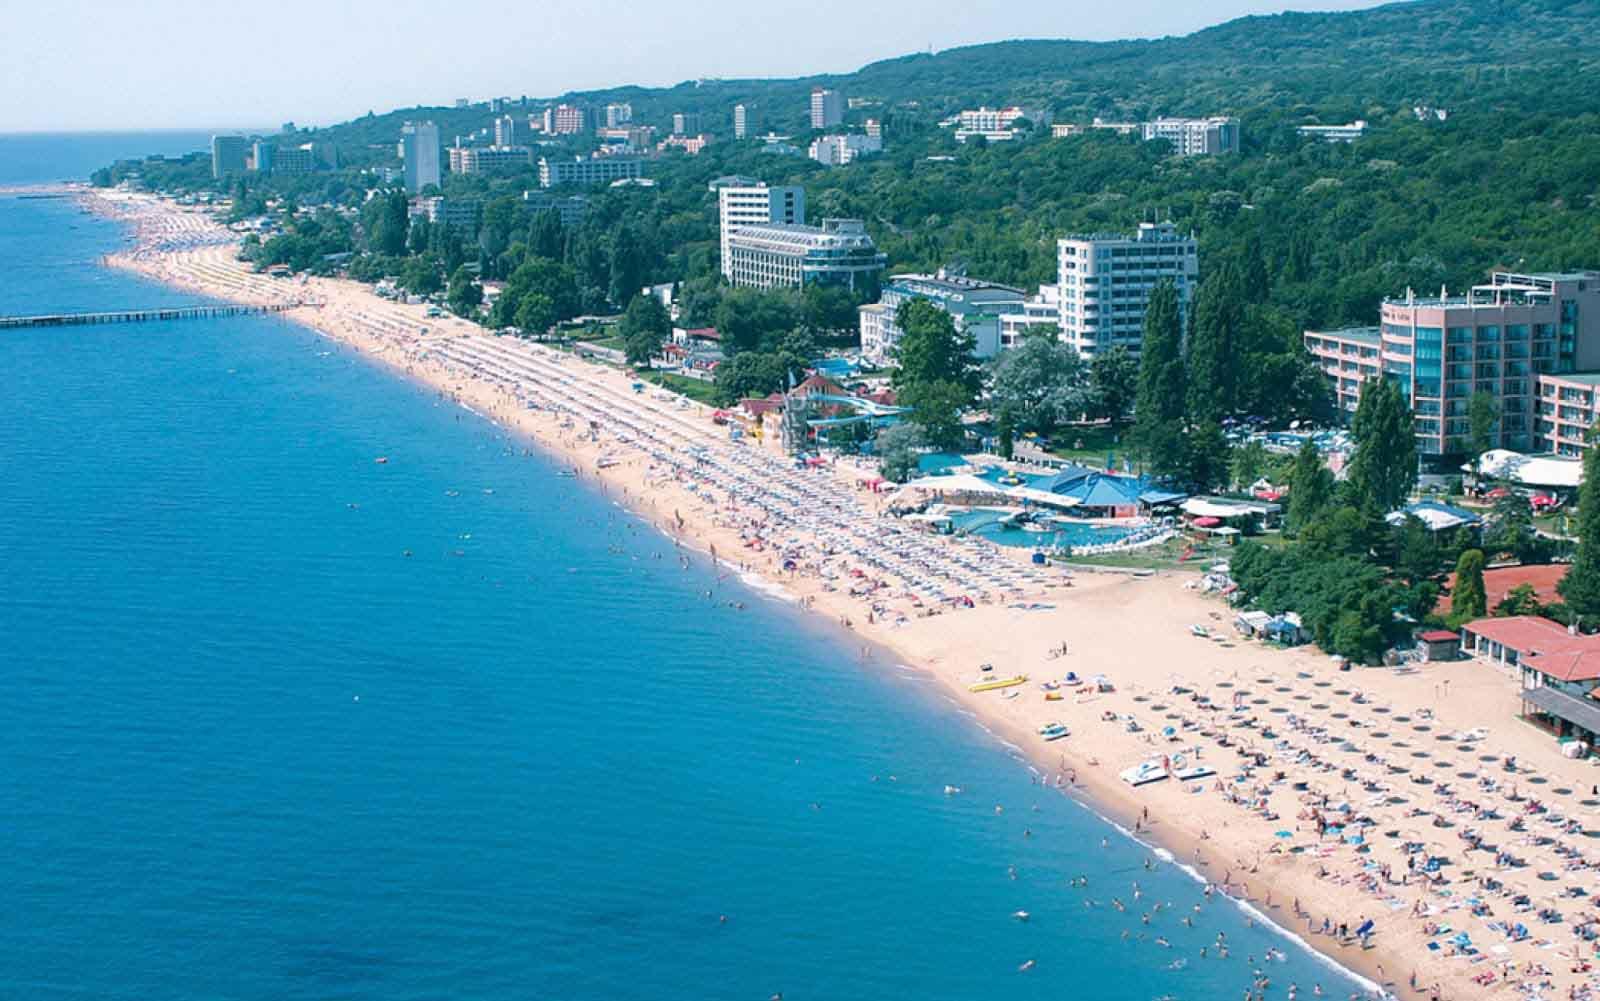 Sunny beach солнечный берег